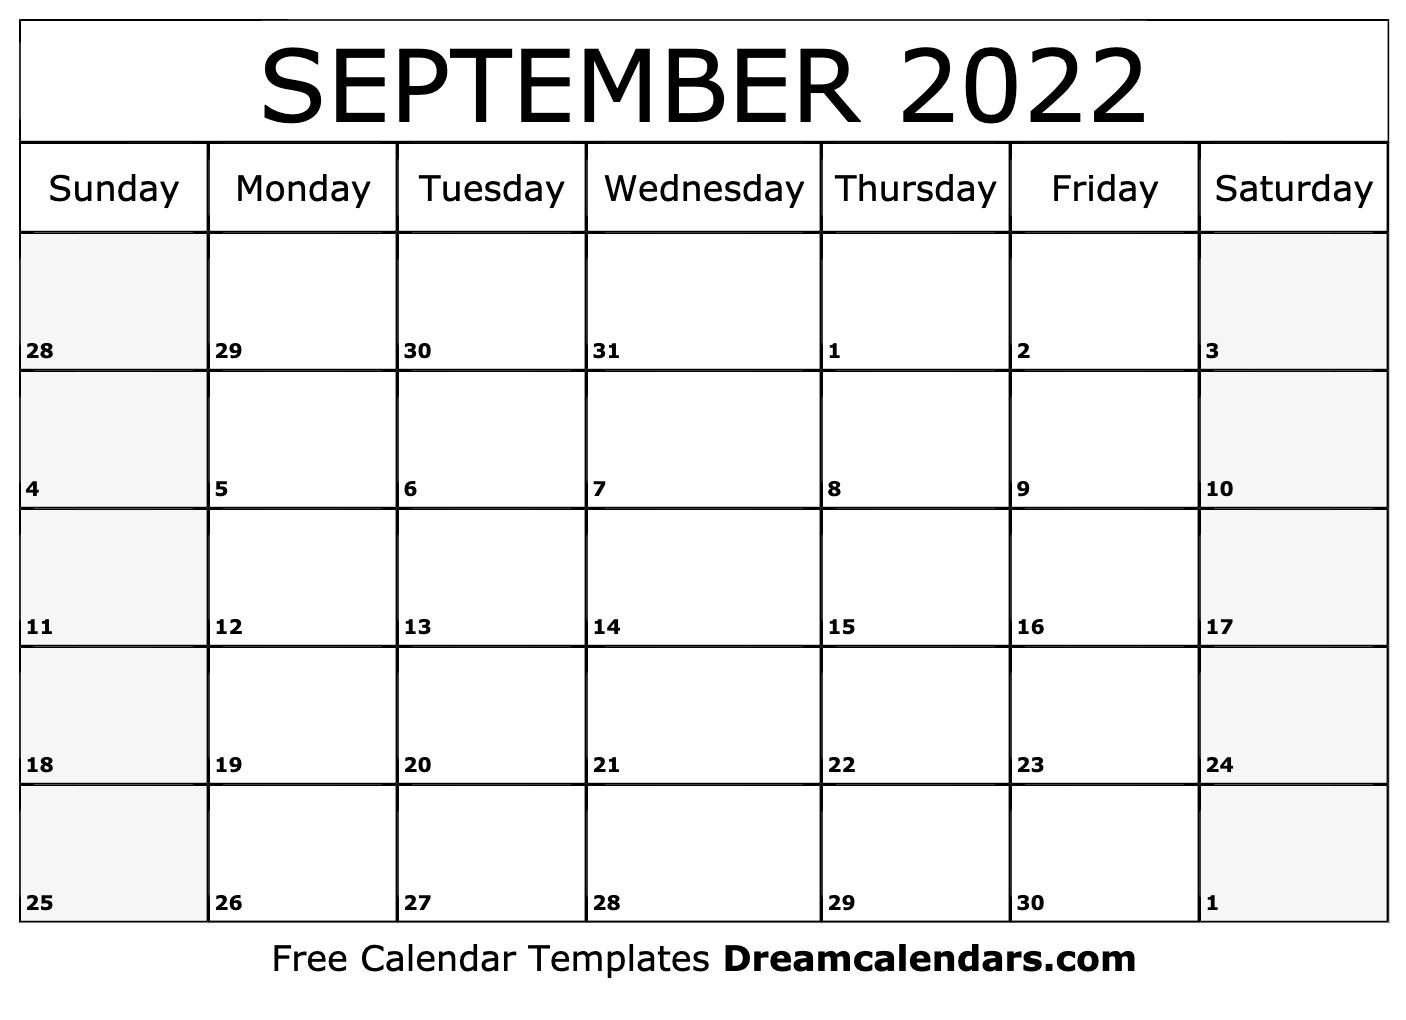 September 2022 Calendar Wallpaper.September 2022 Calendar Free Blank Printable Templates